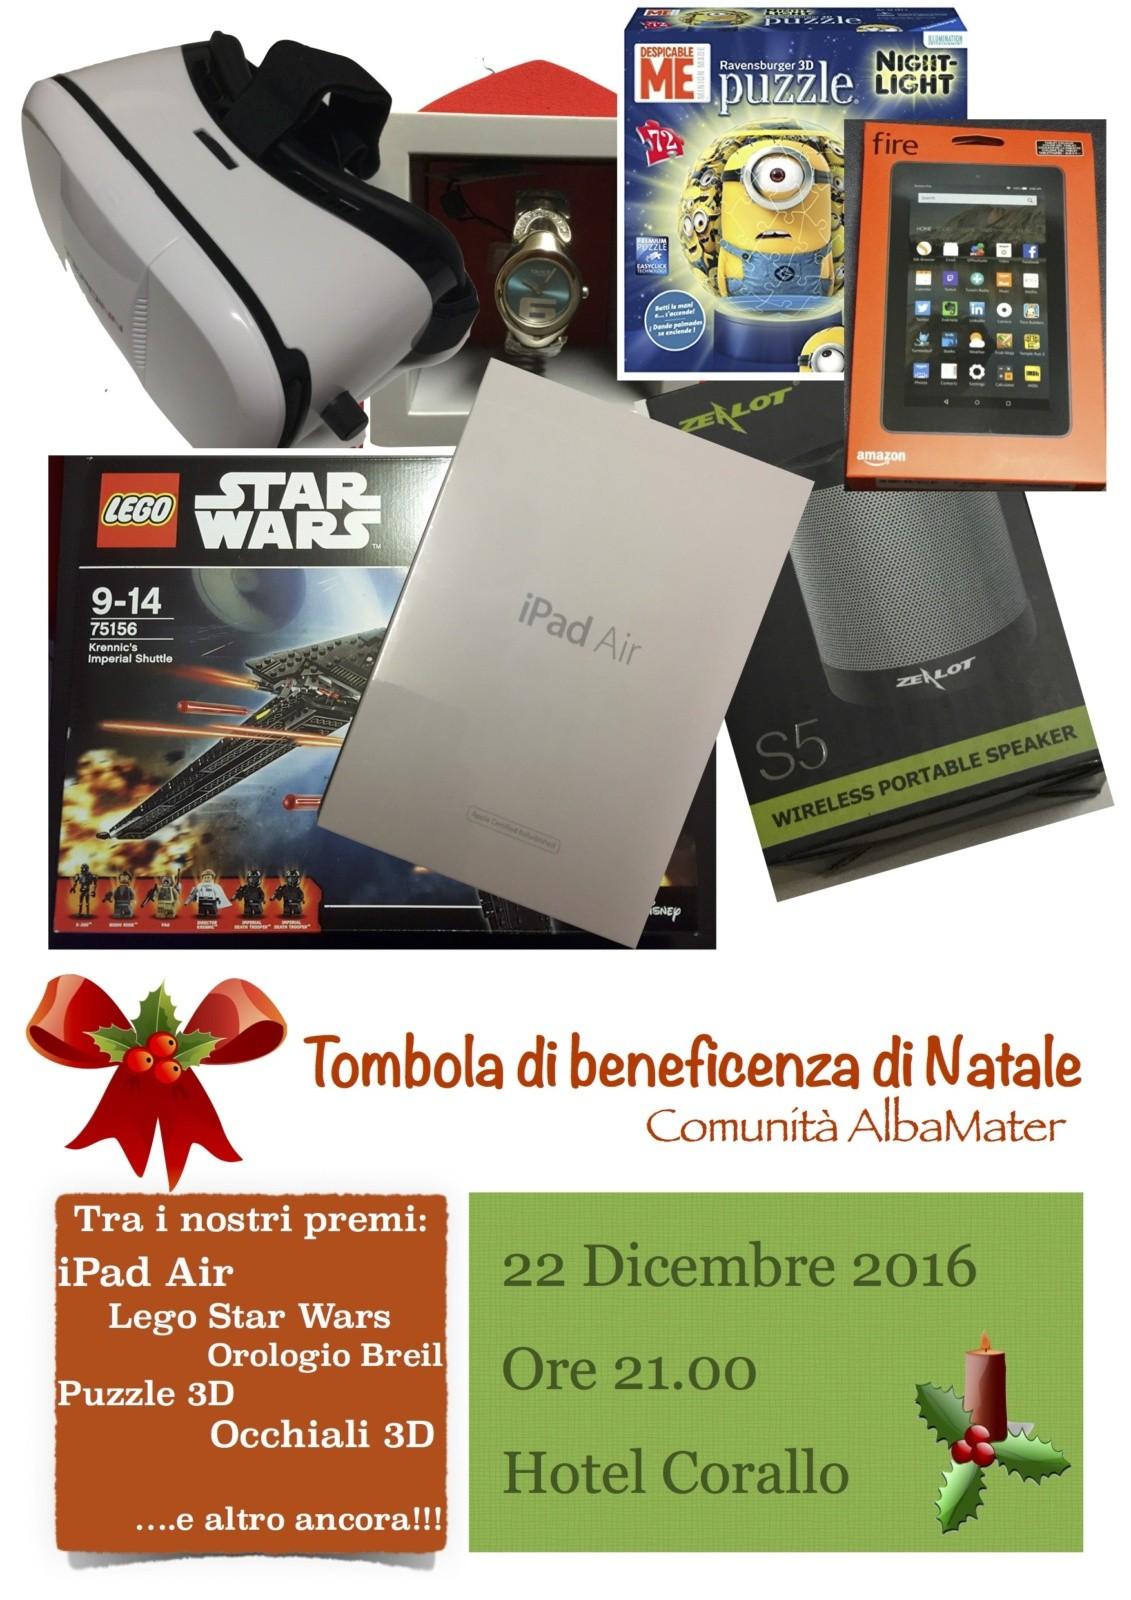 Tombola Natale 2016